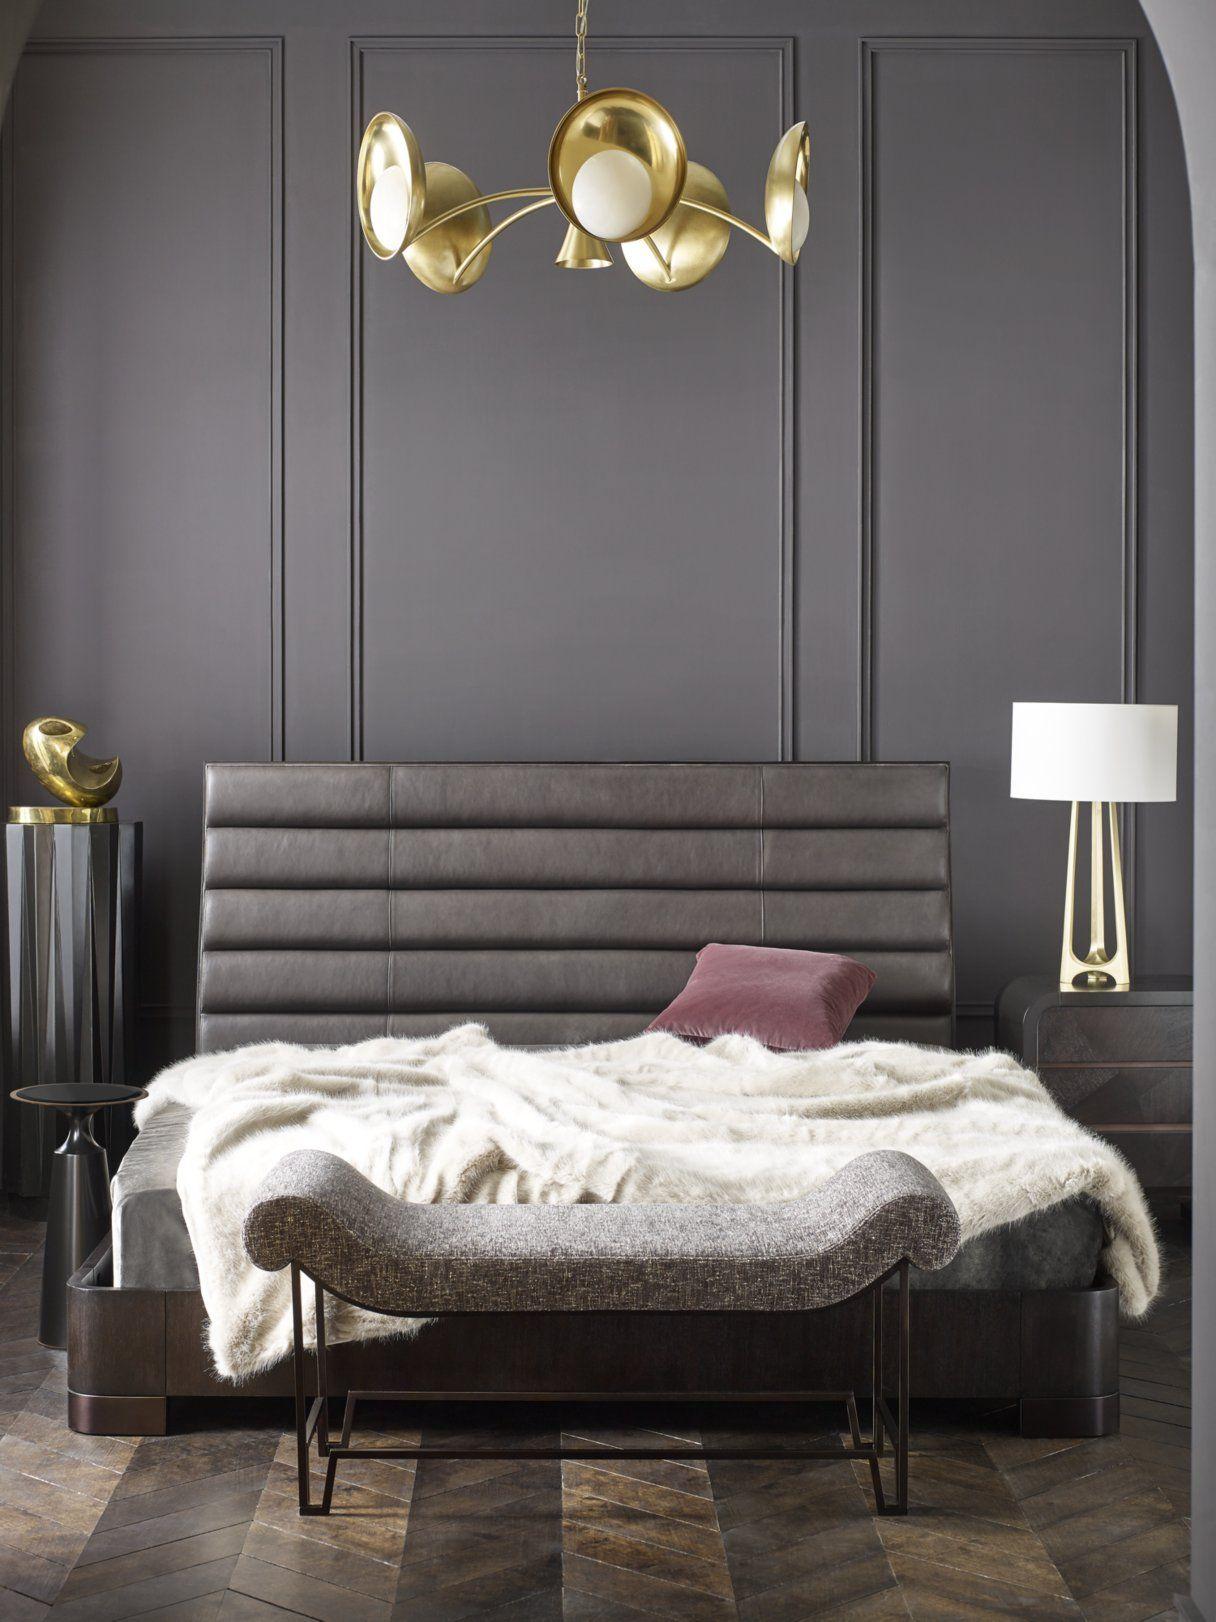 Jean Louis Deniot Baker Furniture Parisian Design Bedroom